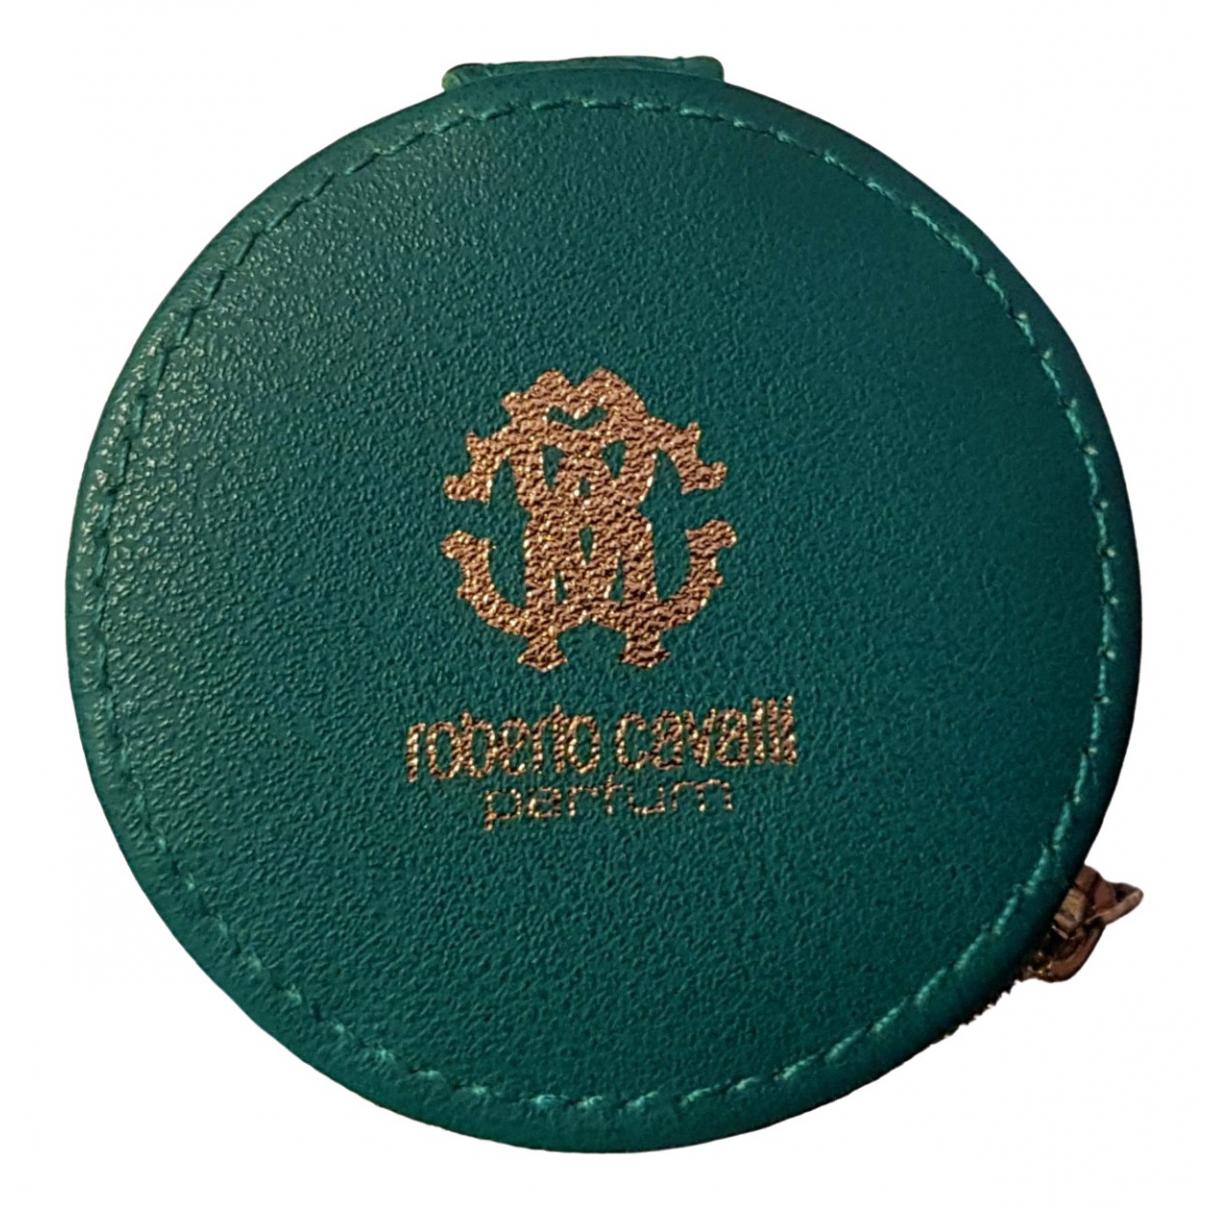 Roberto Cavalli \N Green Leather Travel bag for Women \N